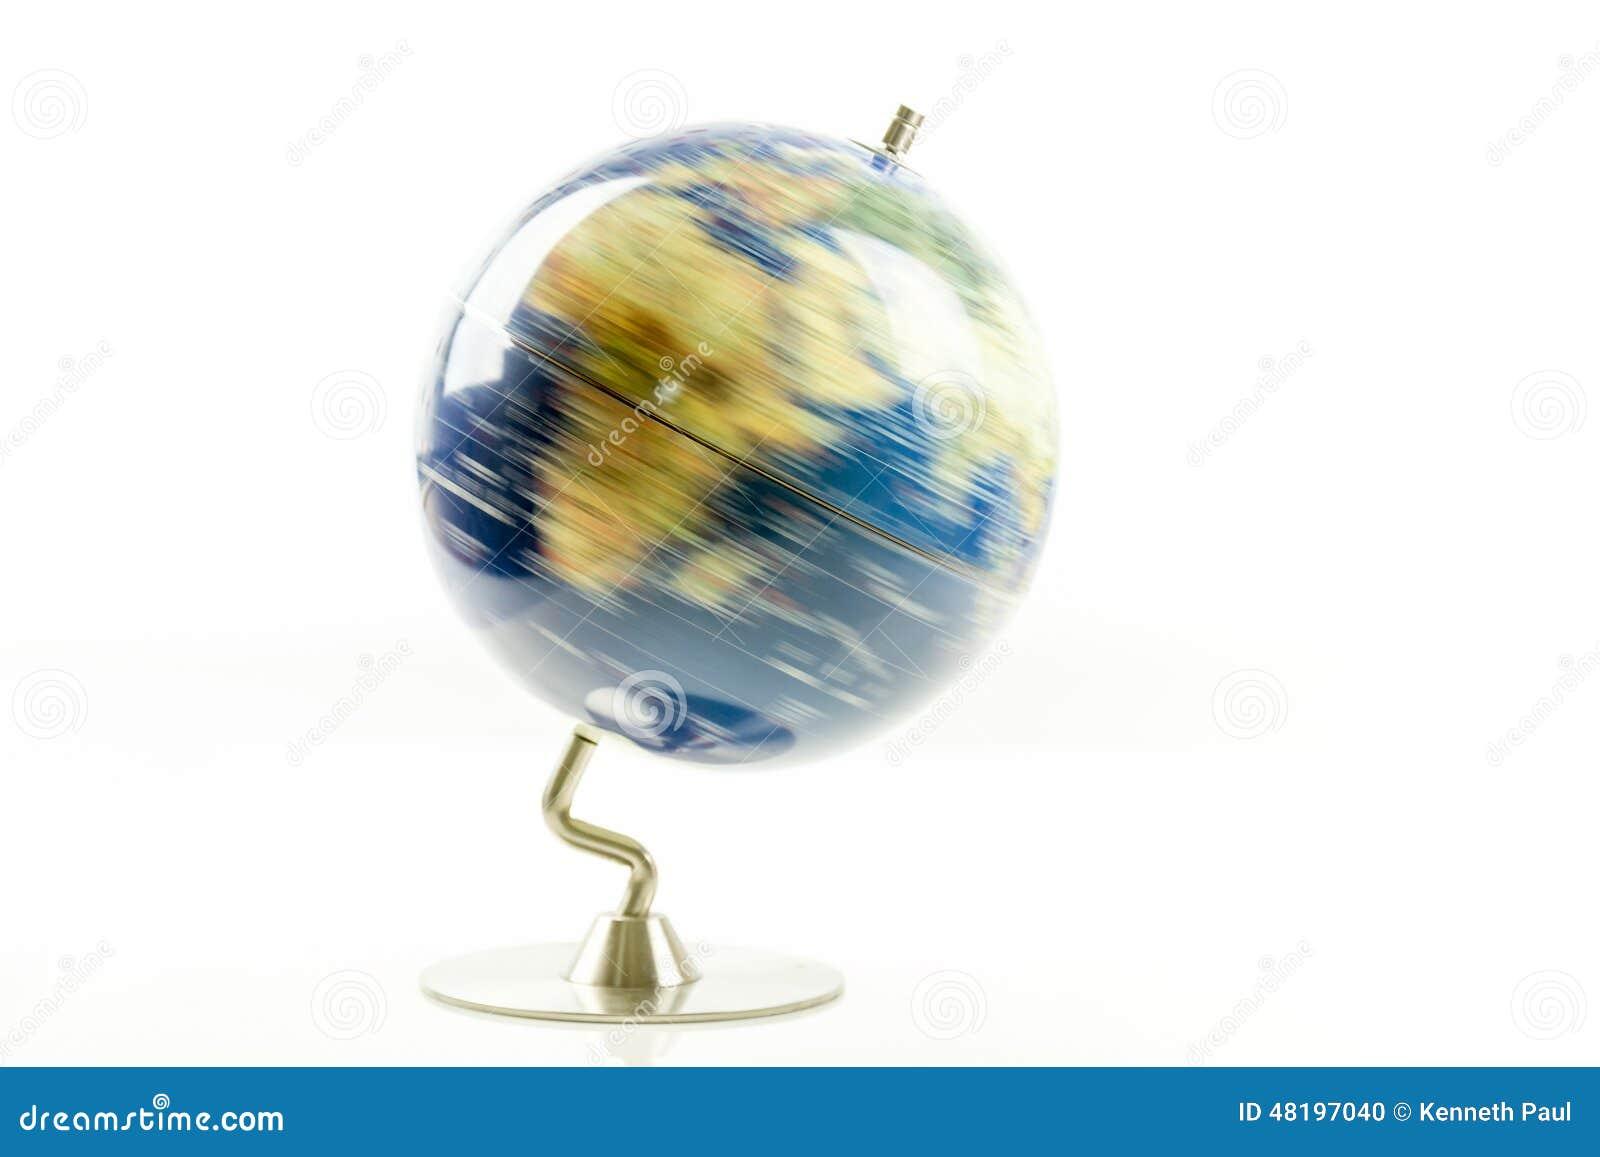 world globe spinning stock photo image of ball blur 48197040